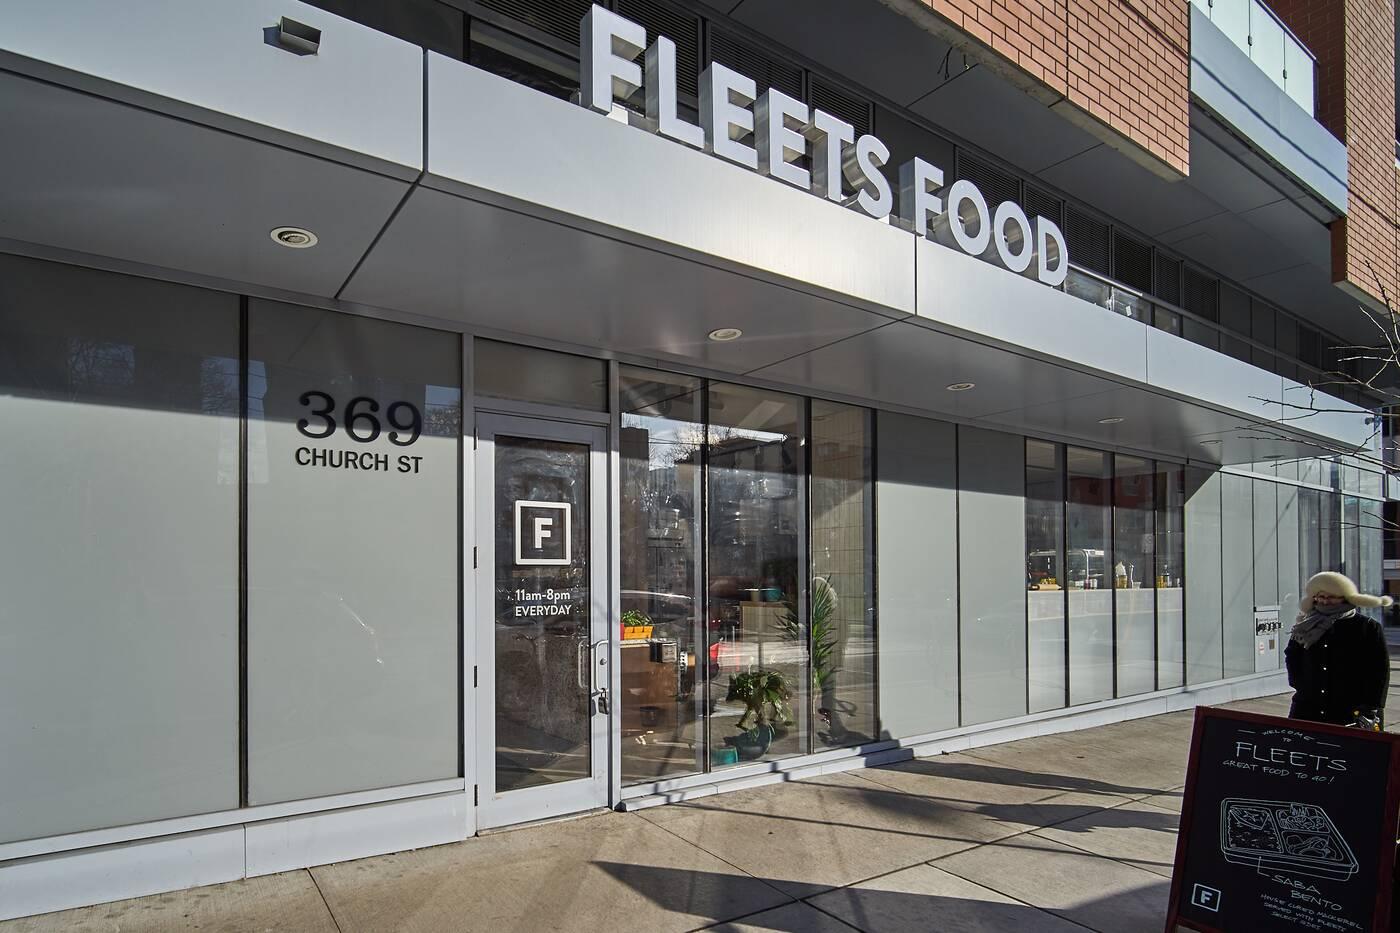 fleets food toronto